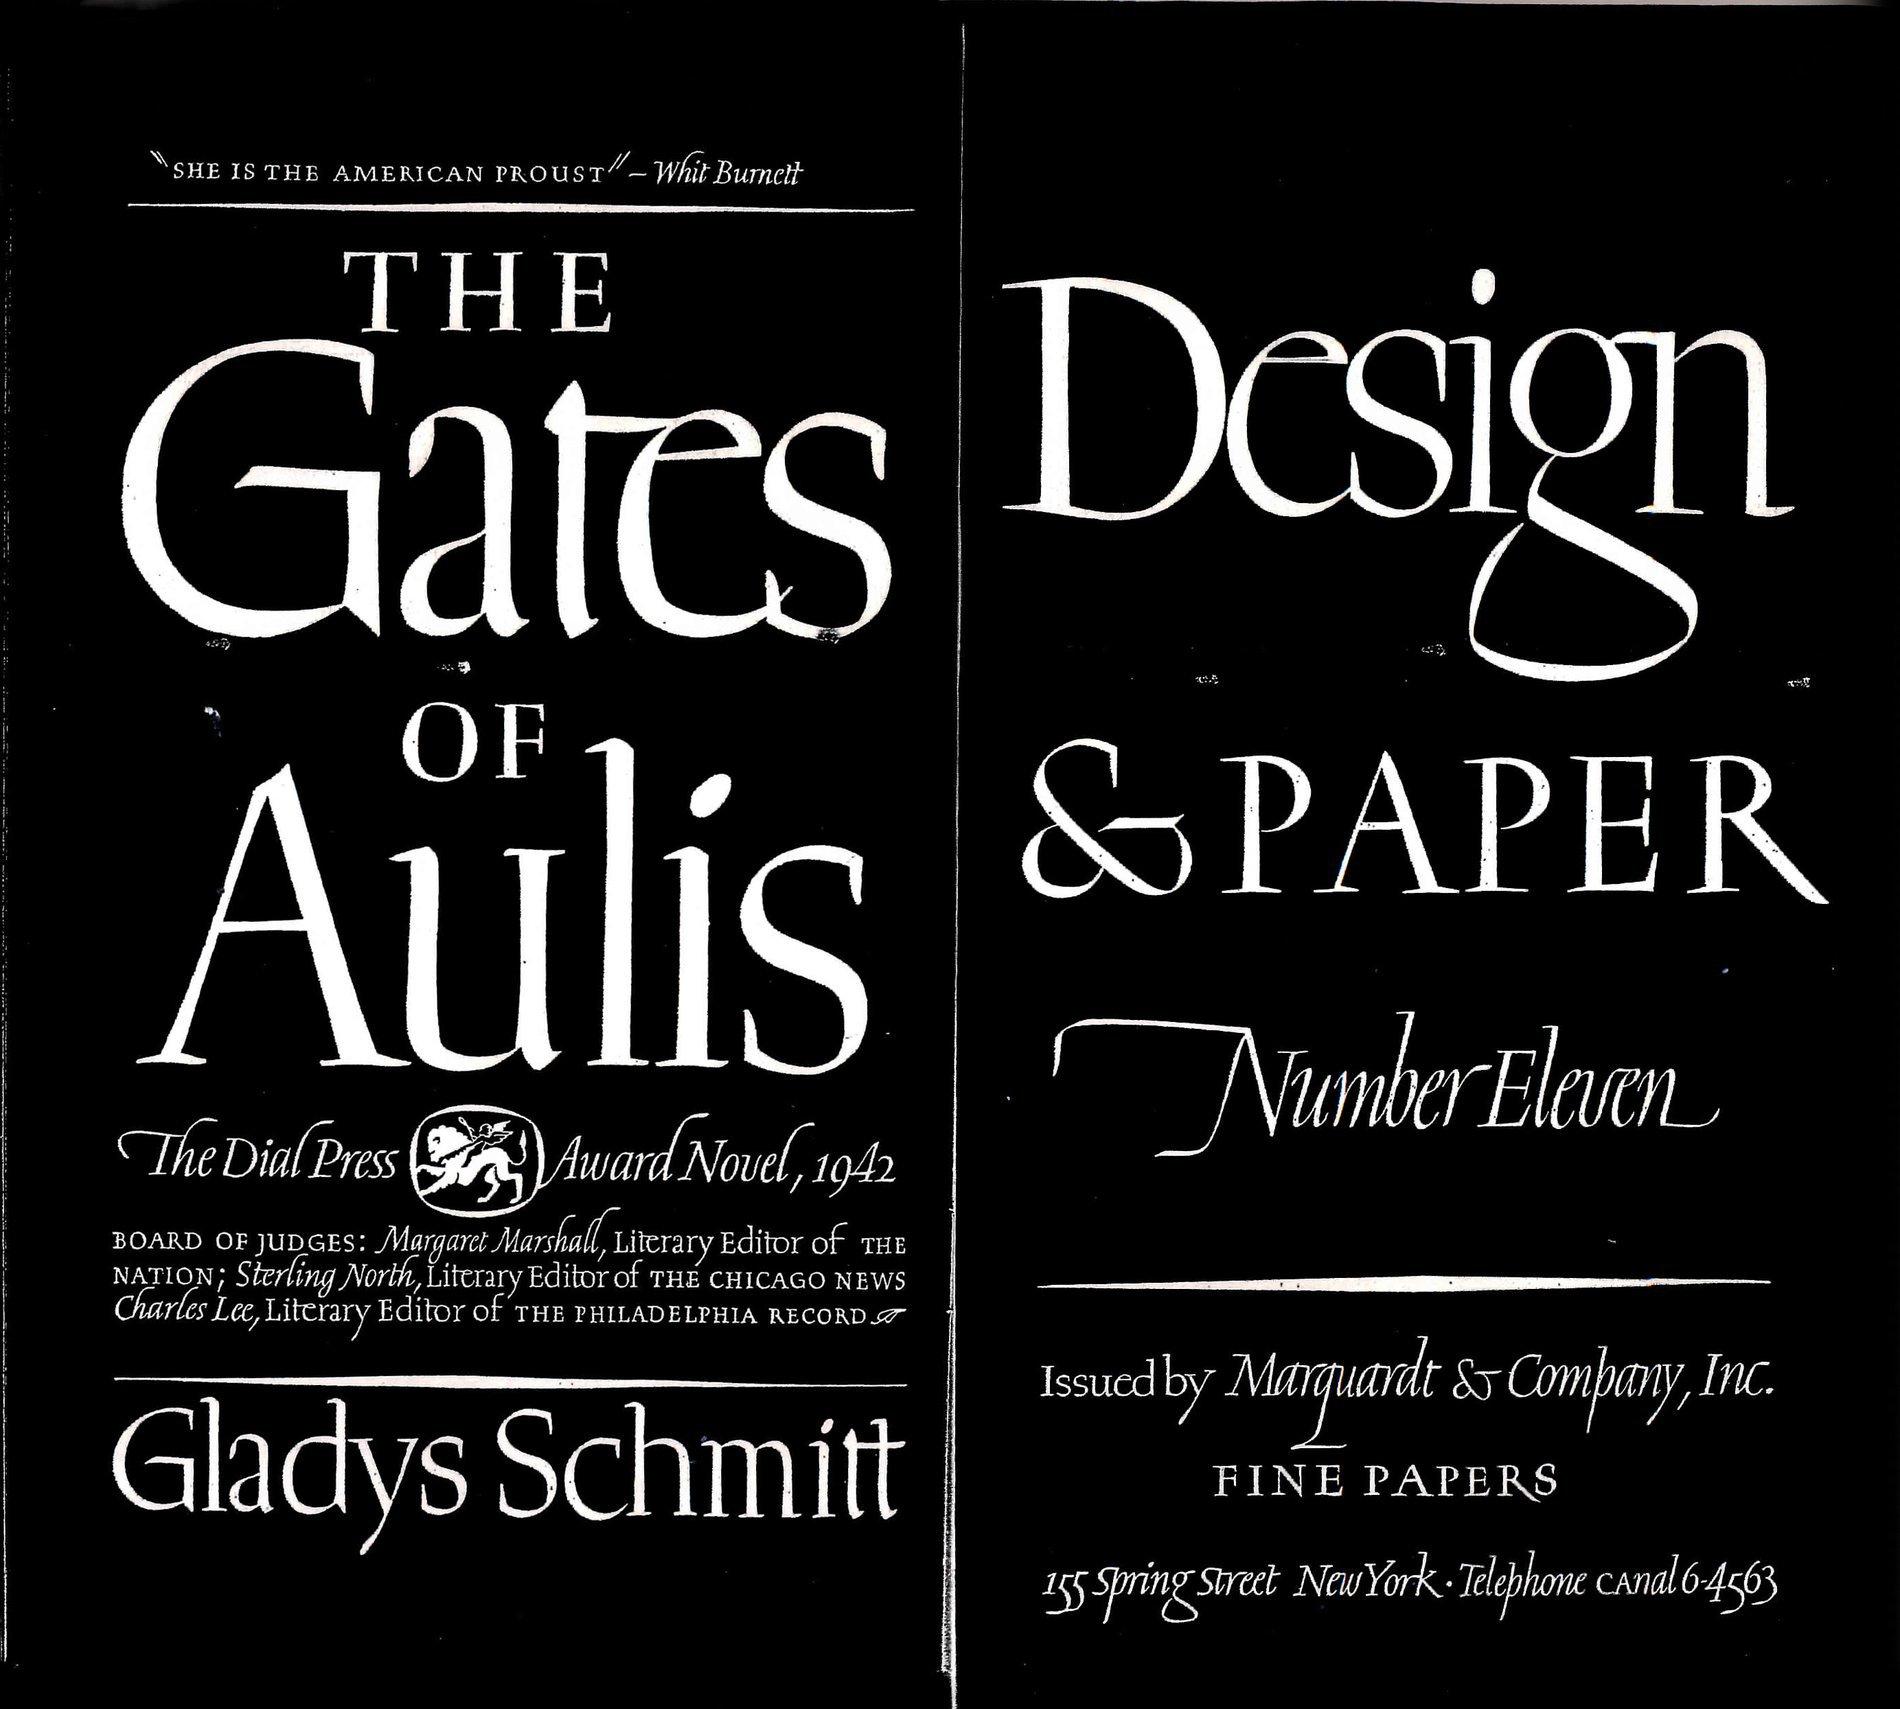 GatesAulis_new.width-1900.jpg